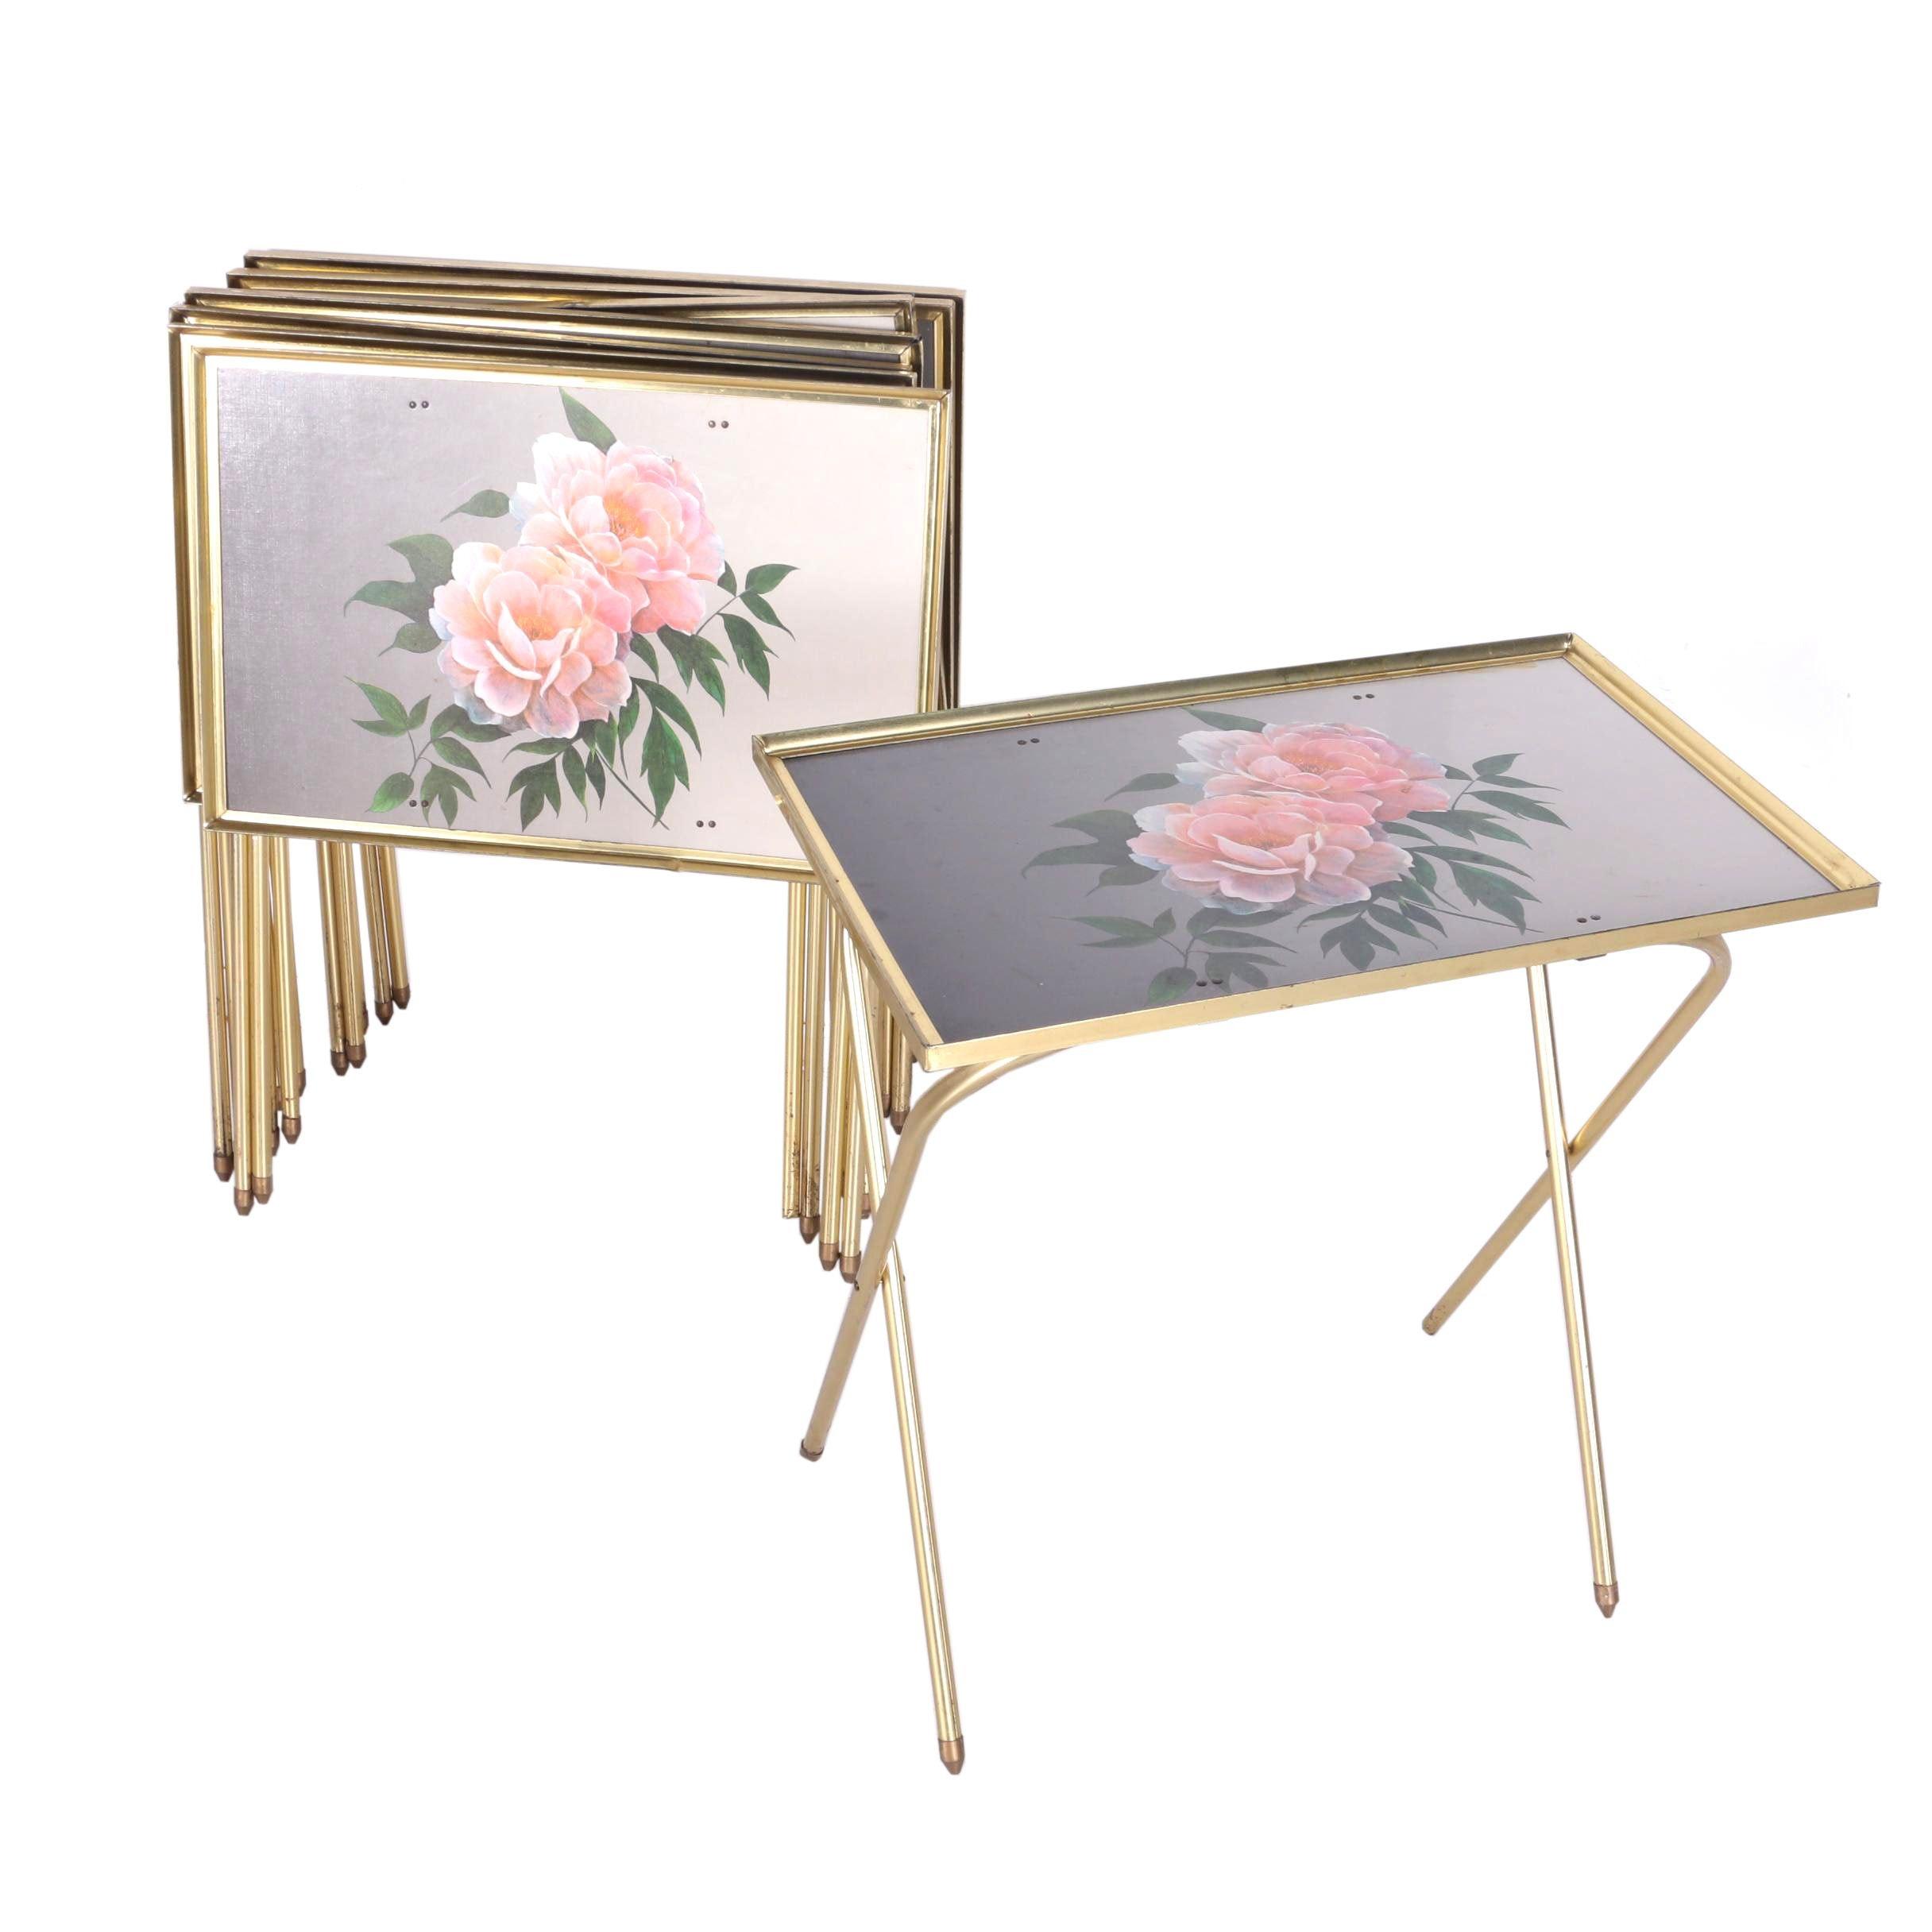 Rose Motif Metal Framed Tray Tables